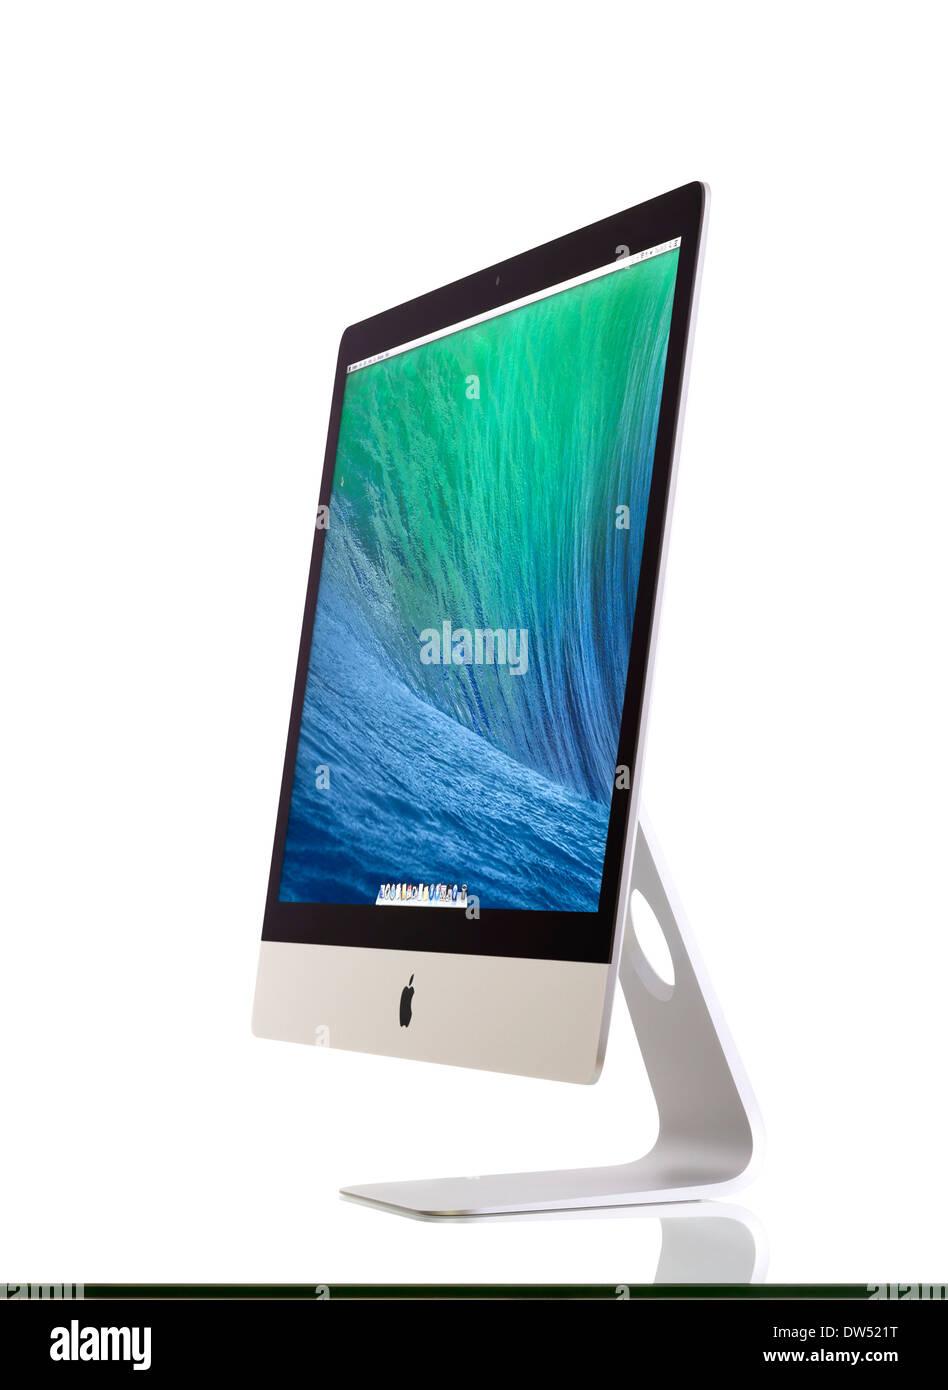 New iMac 27 With OS X Mavericks - Stock Image